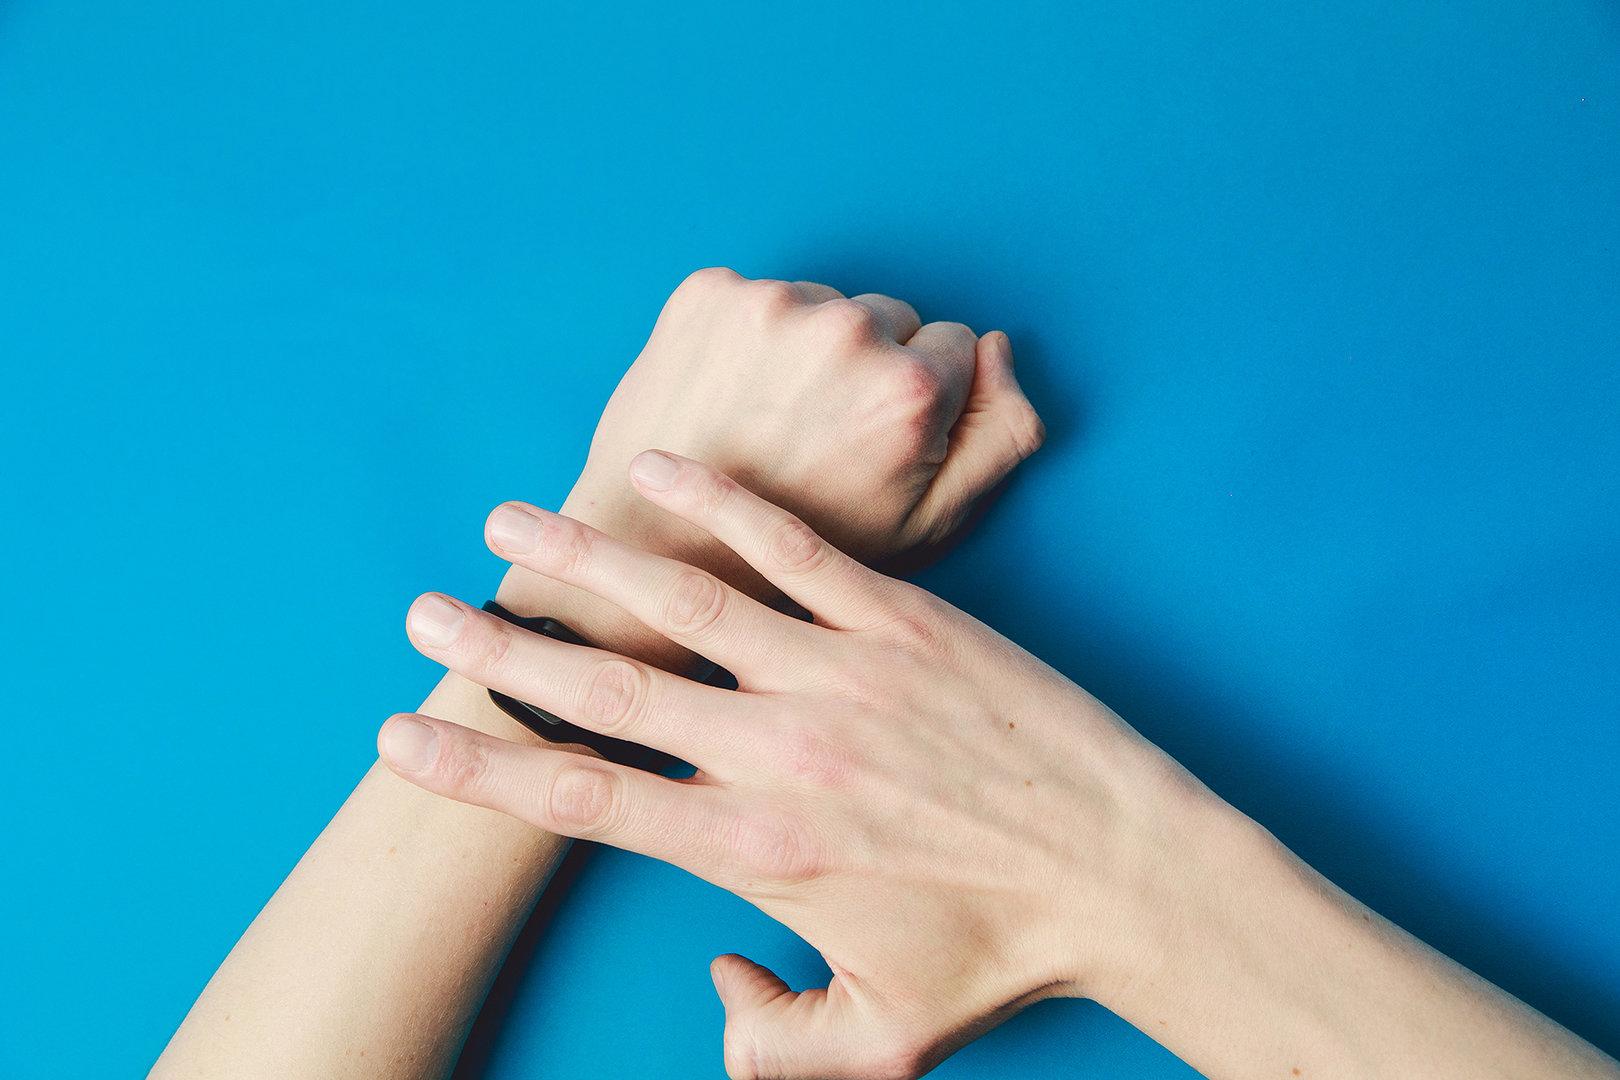 Tapdo: Fingerabdrucksensor fürs Handgelenk